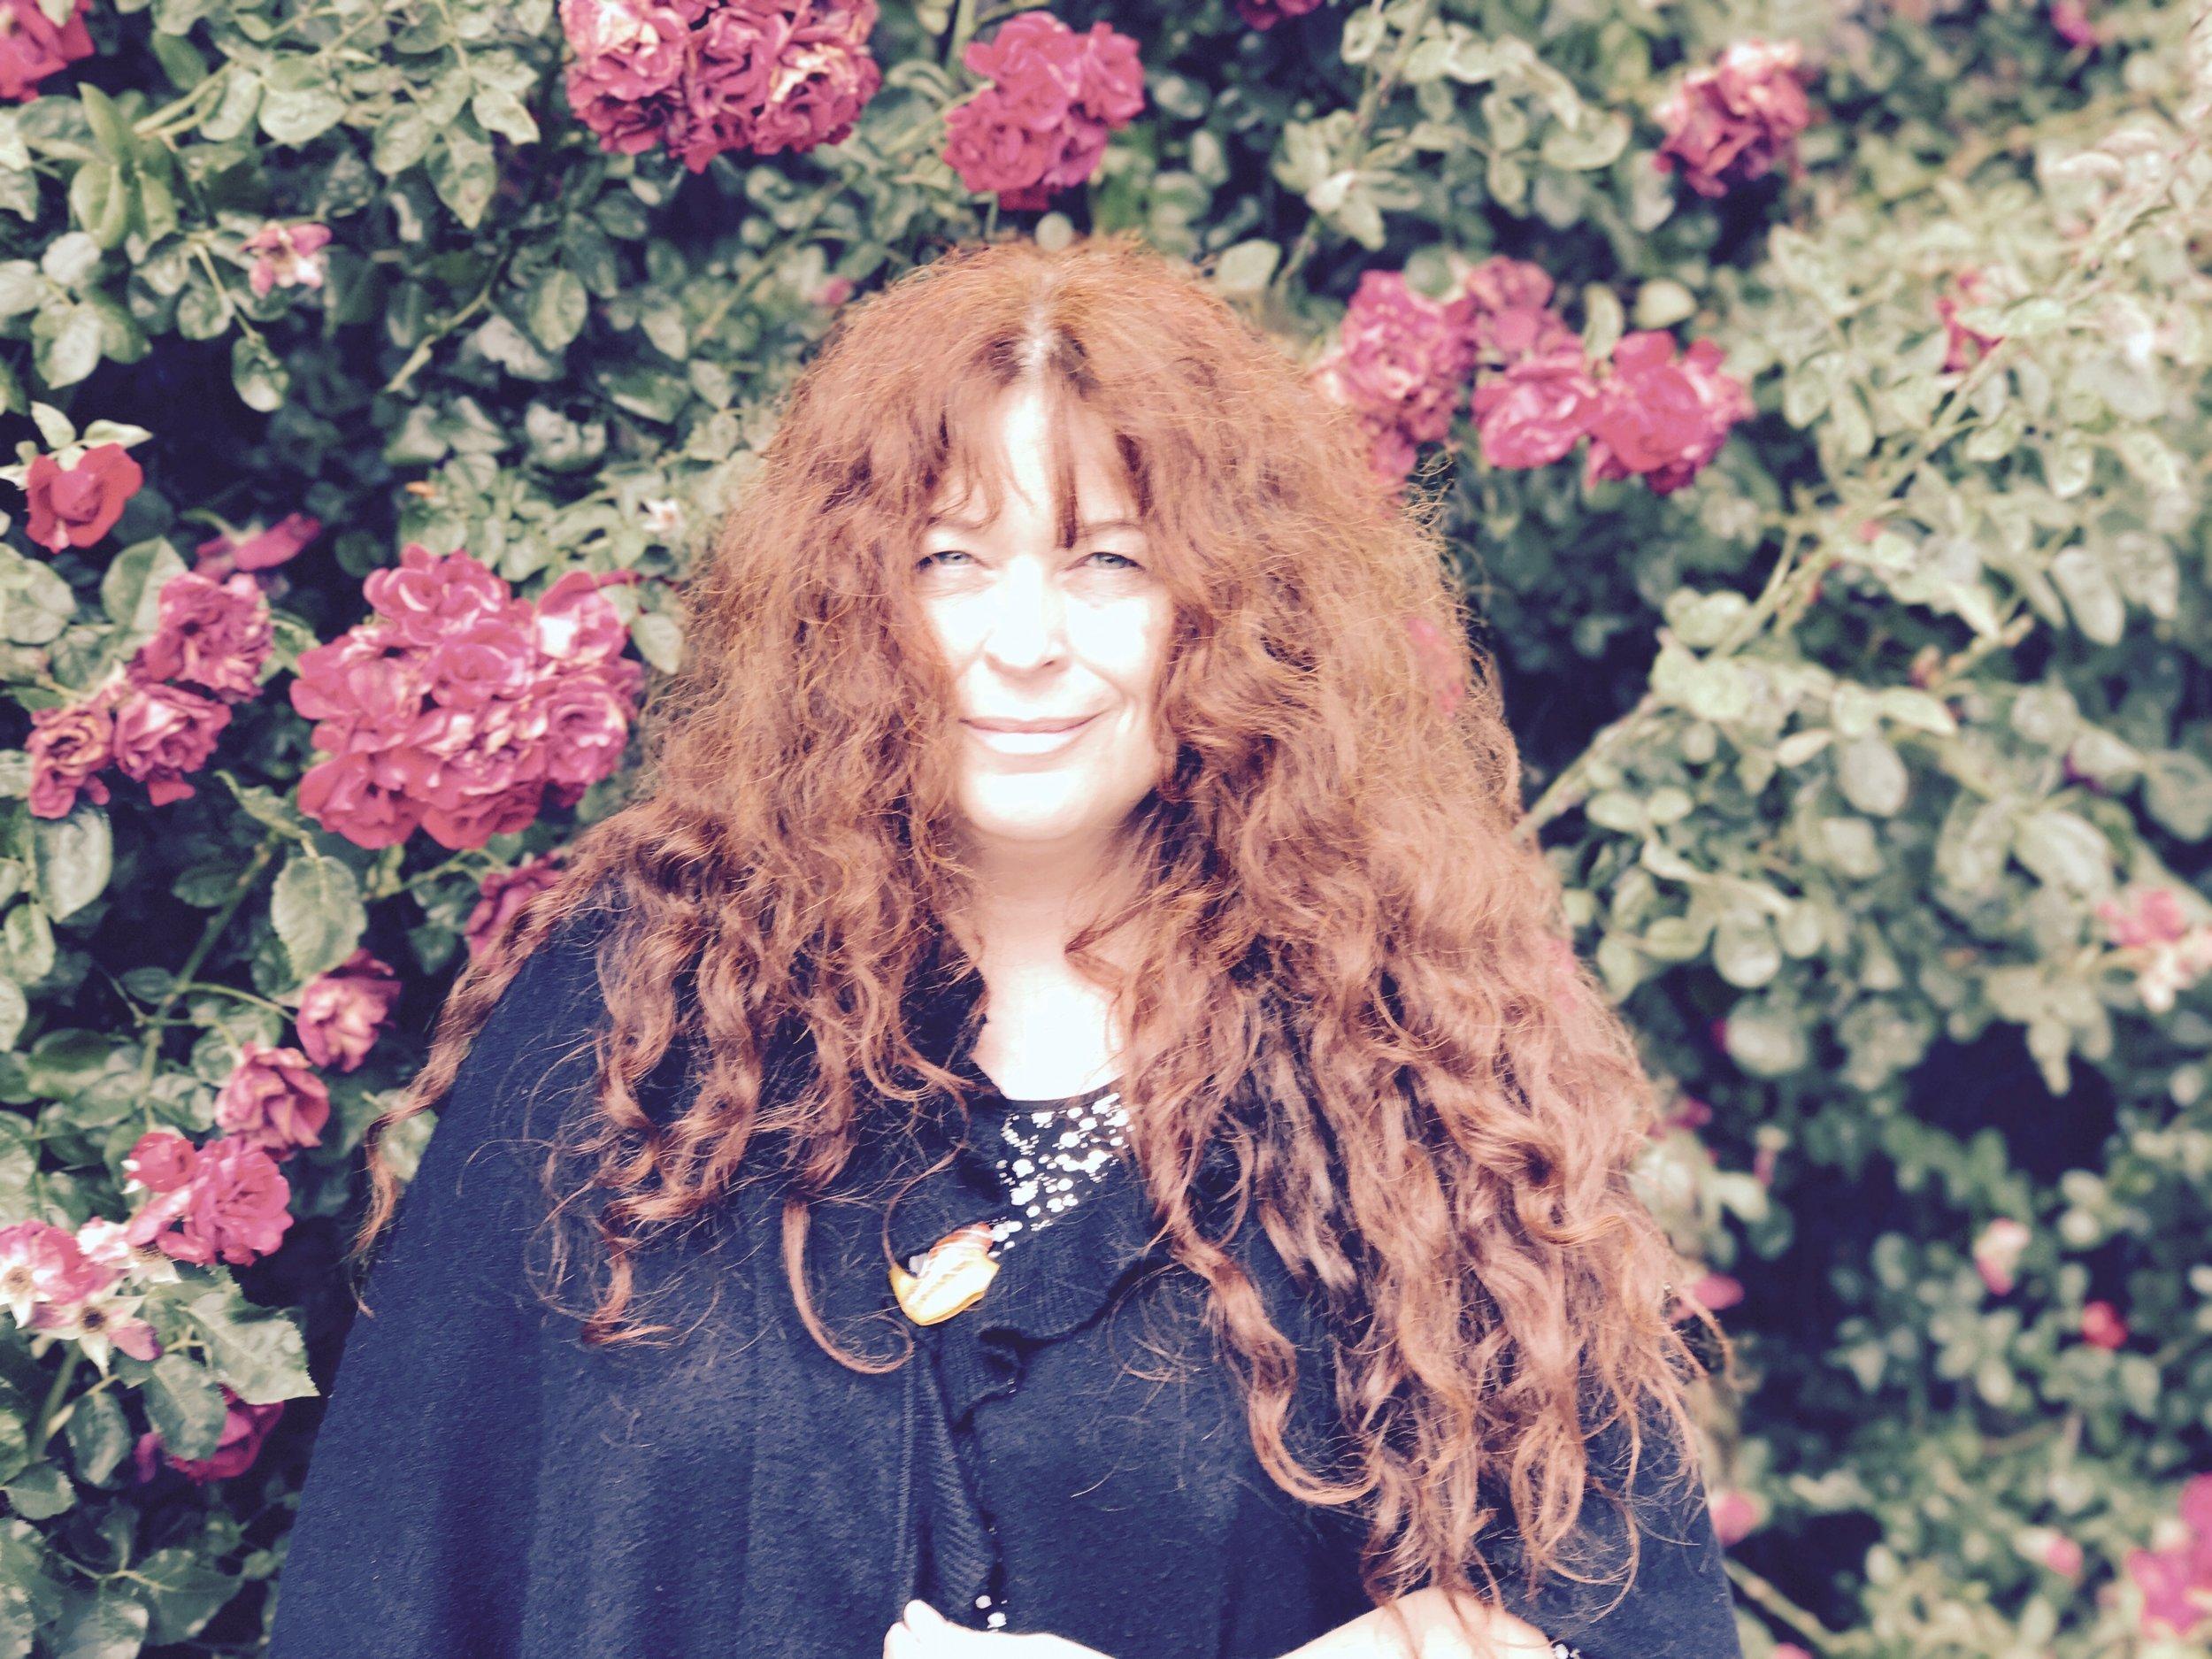 Irene Keller - Cultural activist, curator, host & researcher